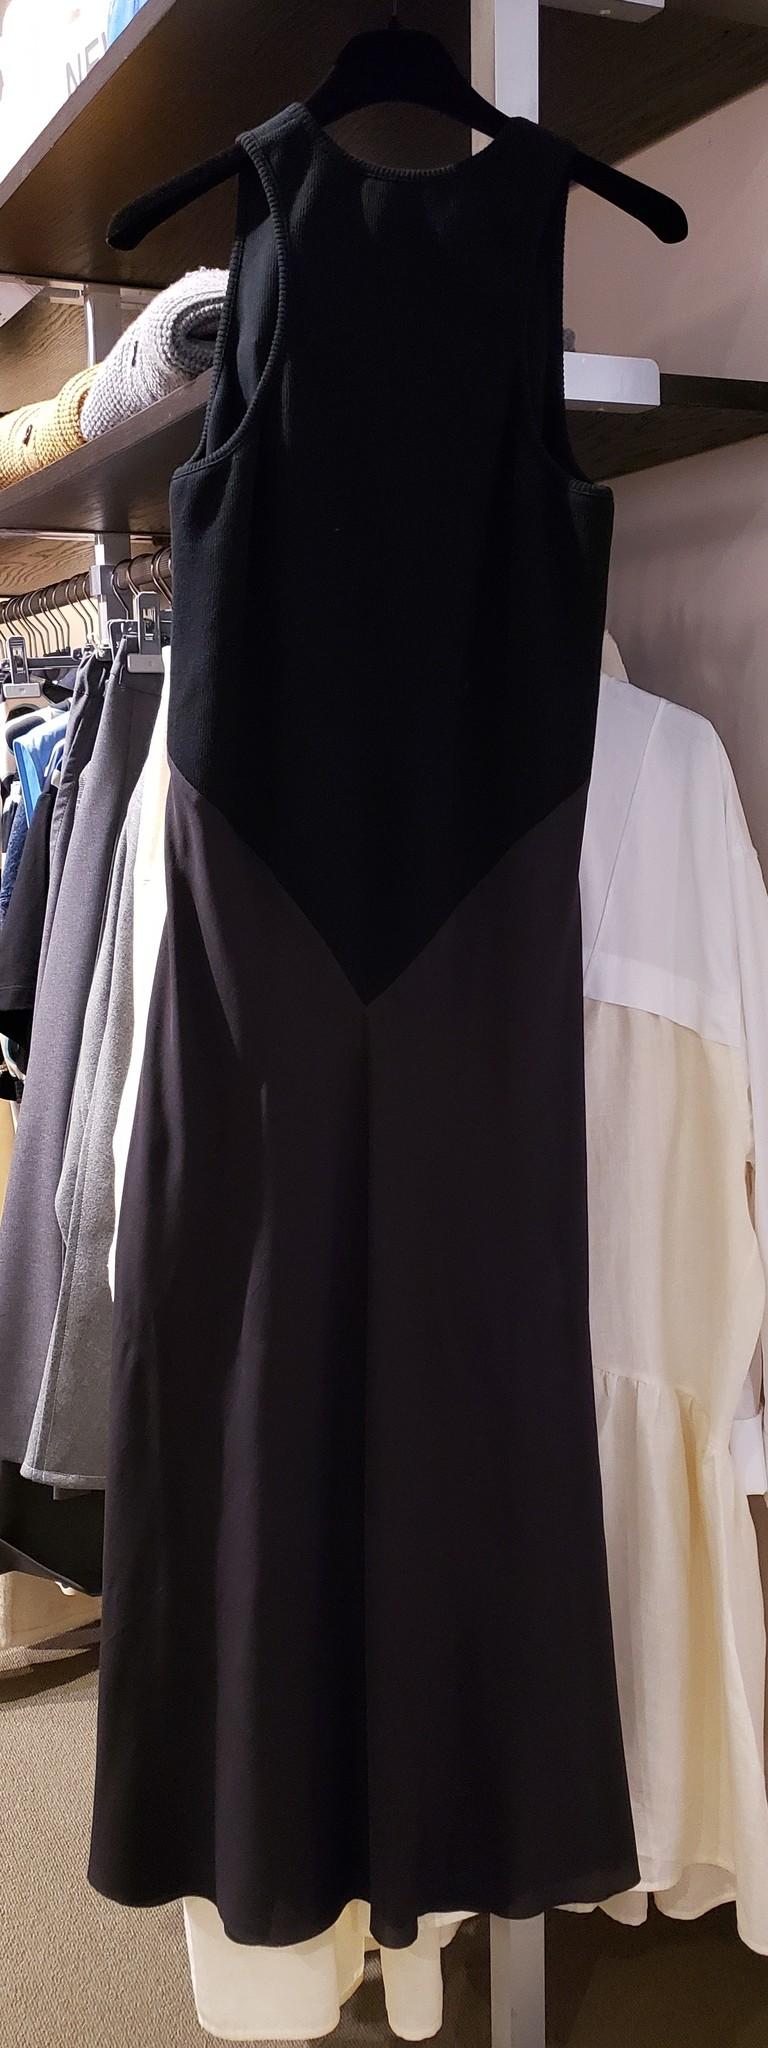 Dress - Black - Sz. 42-2